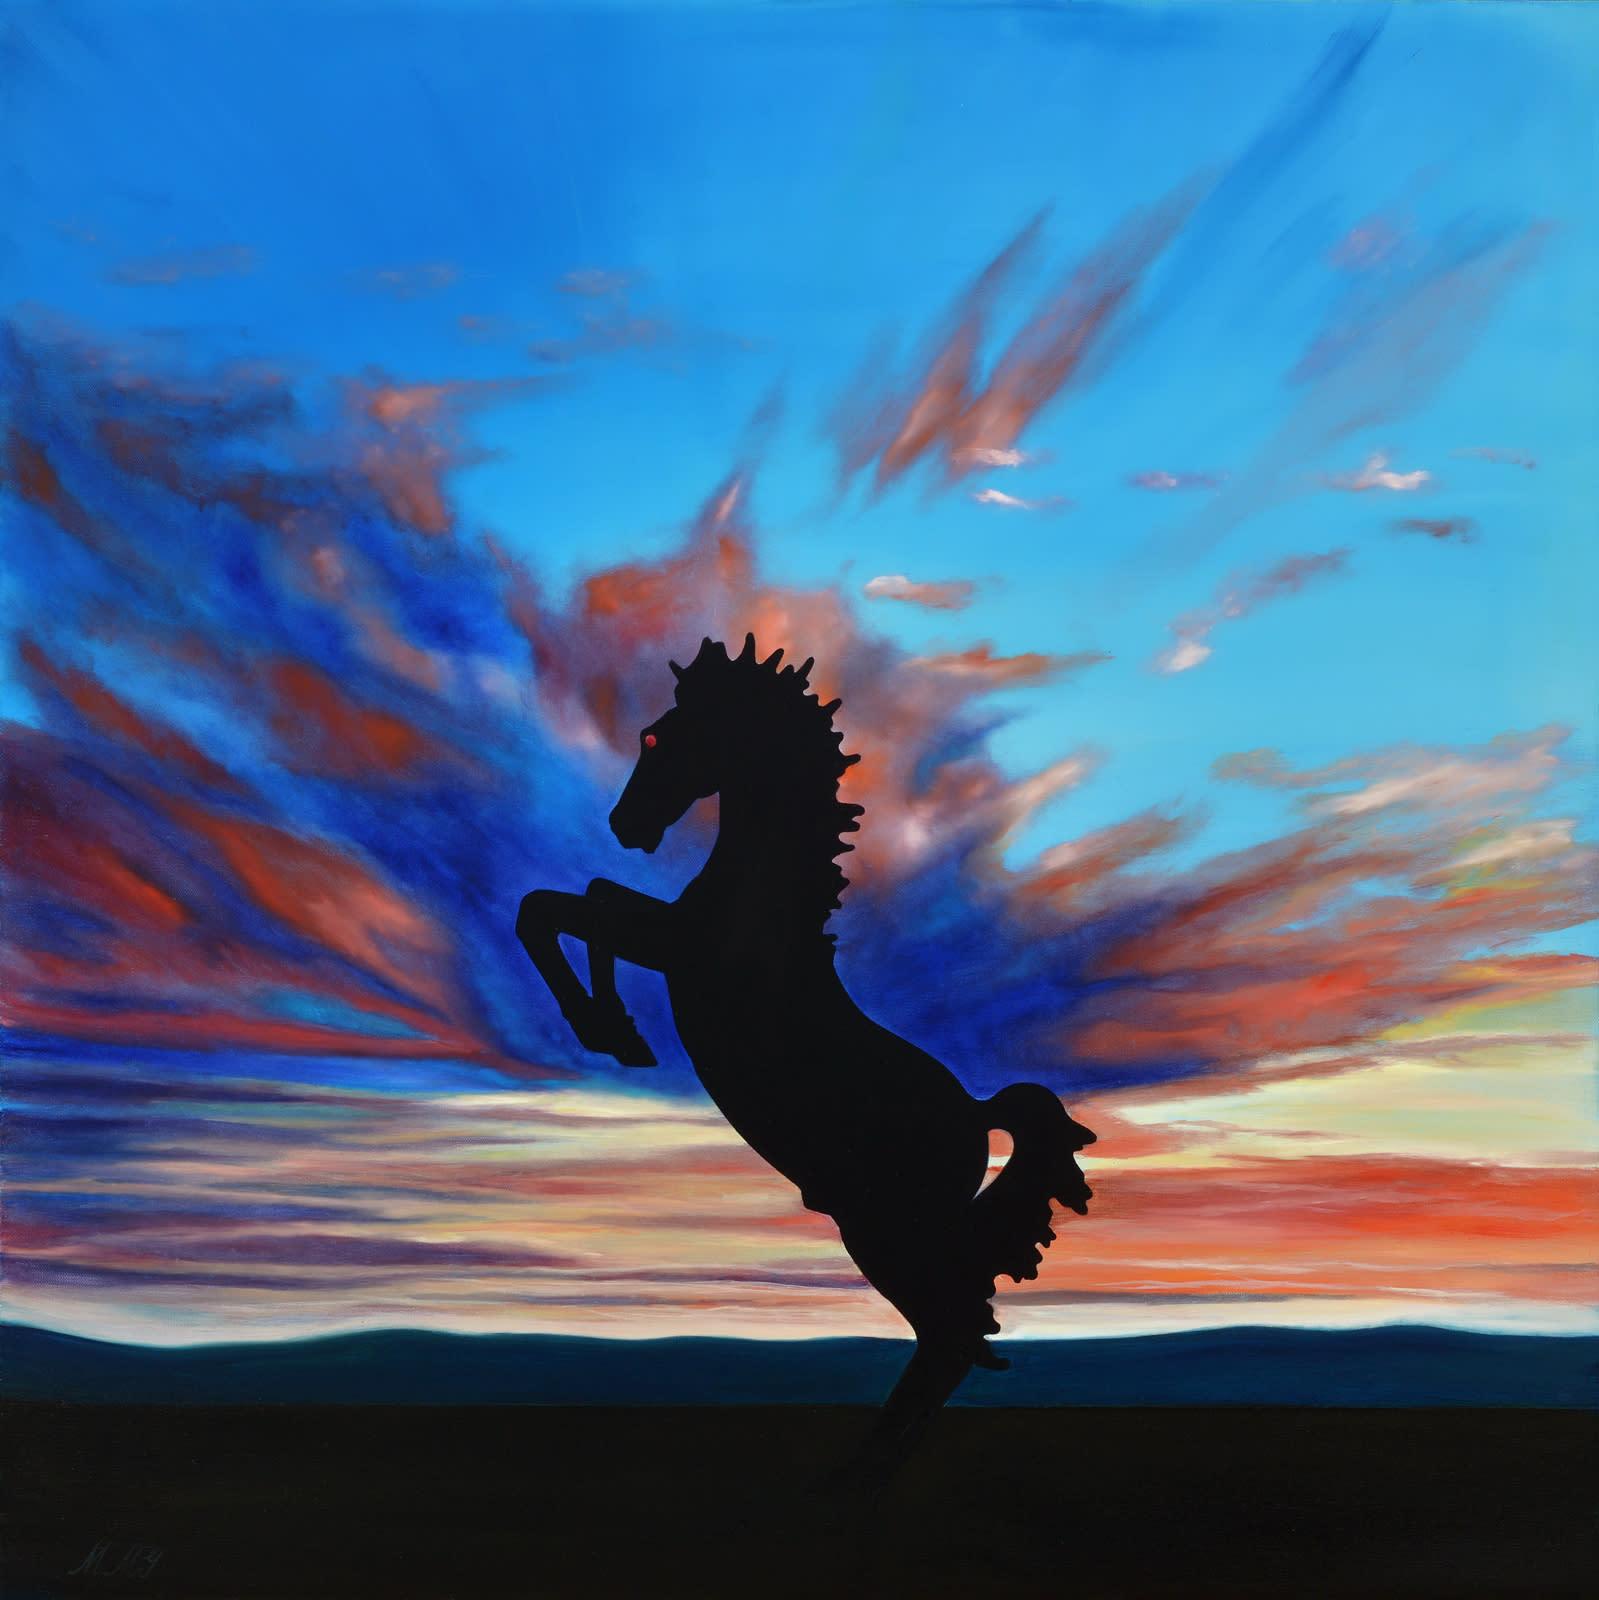 Bluecifer  oil on canvas by monica marquez gatica mmg art studio rcrbn7